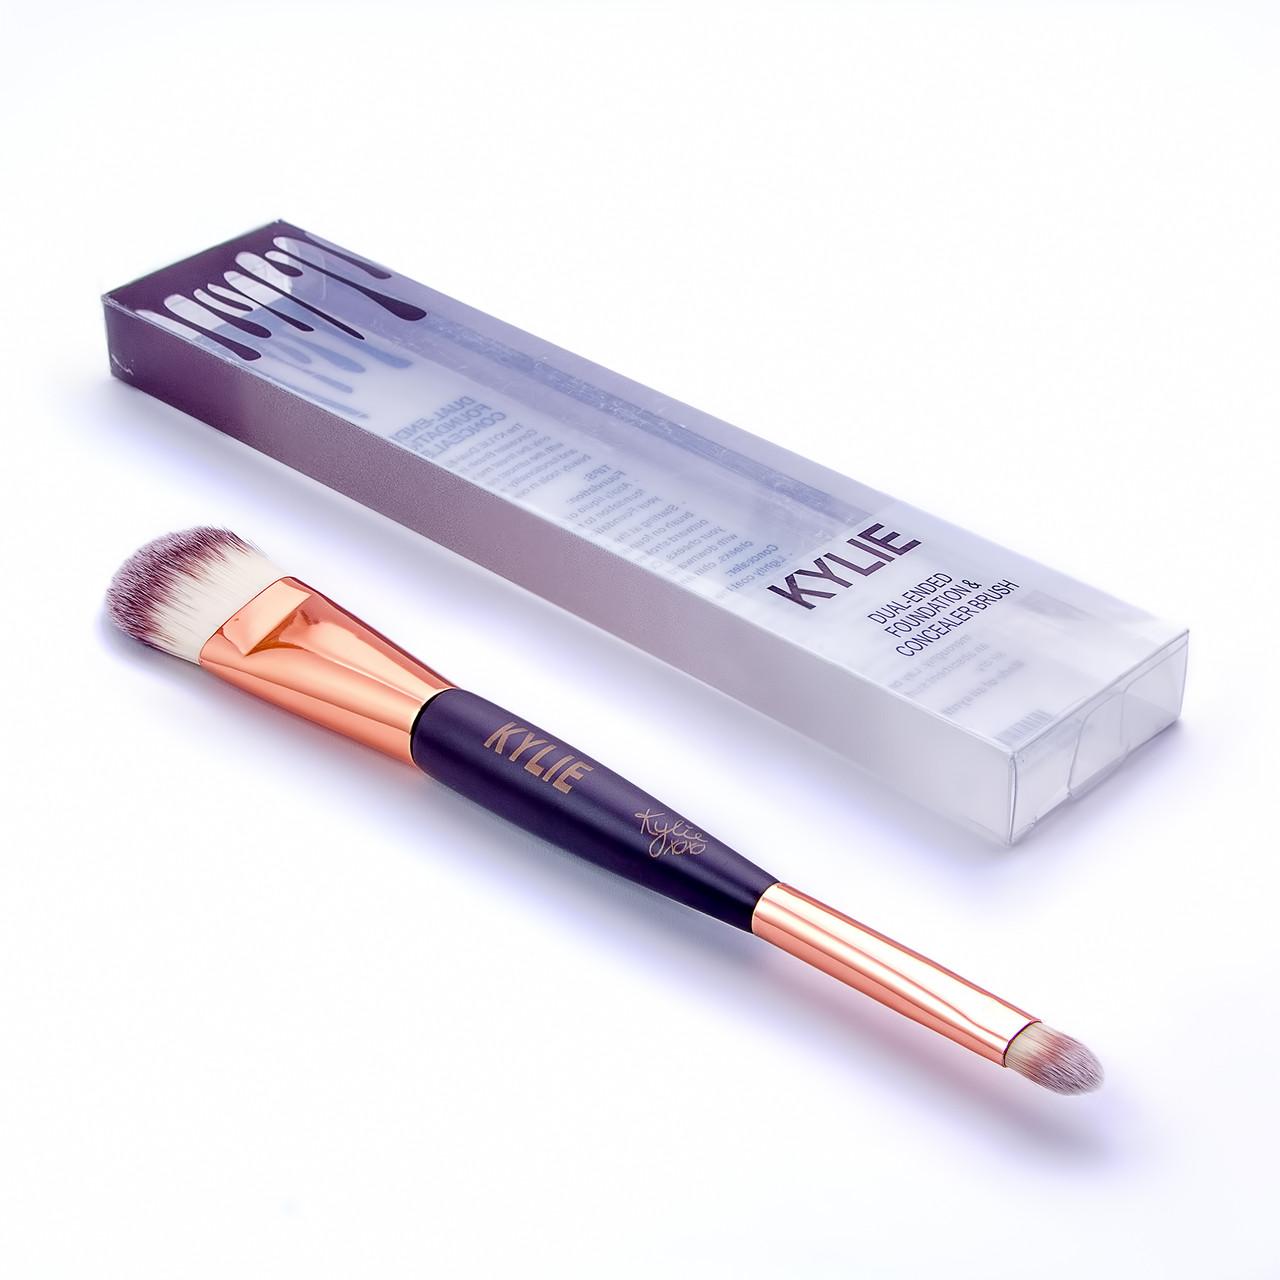 Двусторонняя кисть для макияжа Kylie Dual-ended Foundation & Concealer Brush